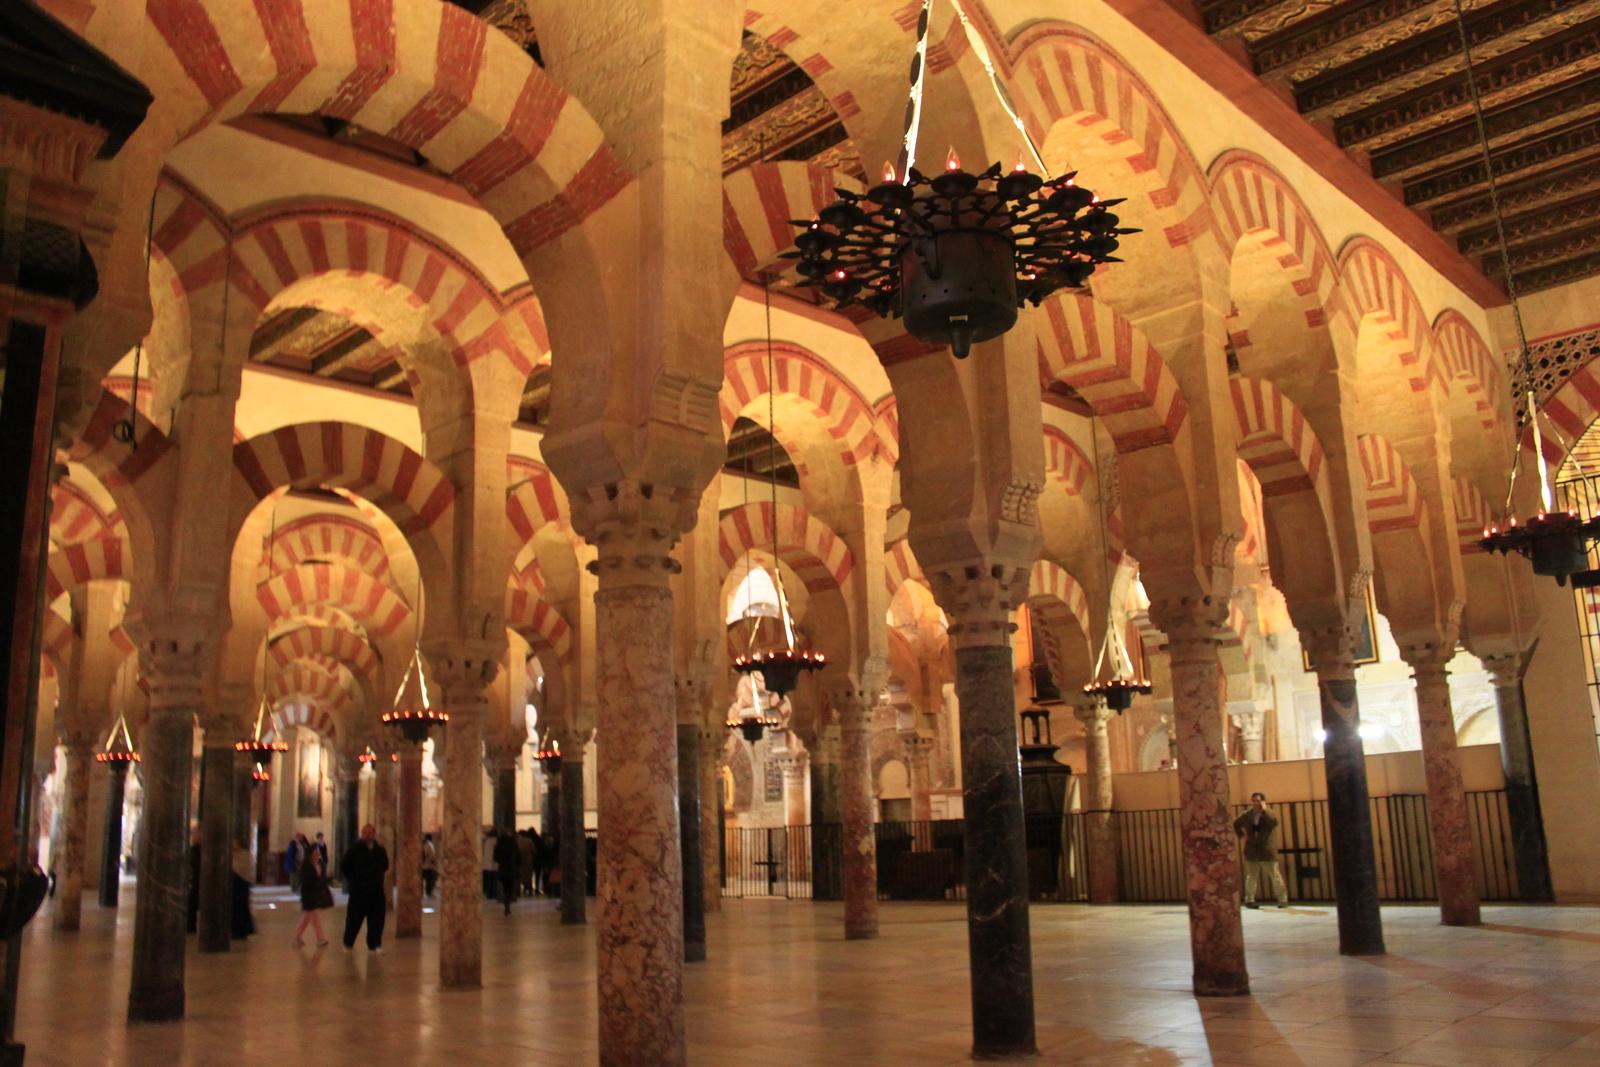 "58 : Mezquita of Cordoba<br /> <br /> Mezquita Gallery:<br />  <a href=""http://www.rishisankar.com/Travel/Spain/Cordoba-2010-22nd-February/11317949_hdVmo#794522786_UrBVa"">http://www.rishisankar.com/Travel/Spain/Cordoba-2010-22nd-February/11317949_hdVmo#794522786_UrBVa</a>"